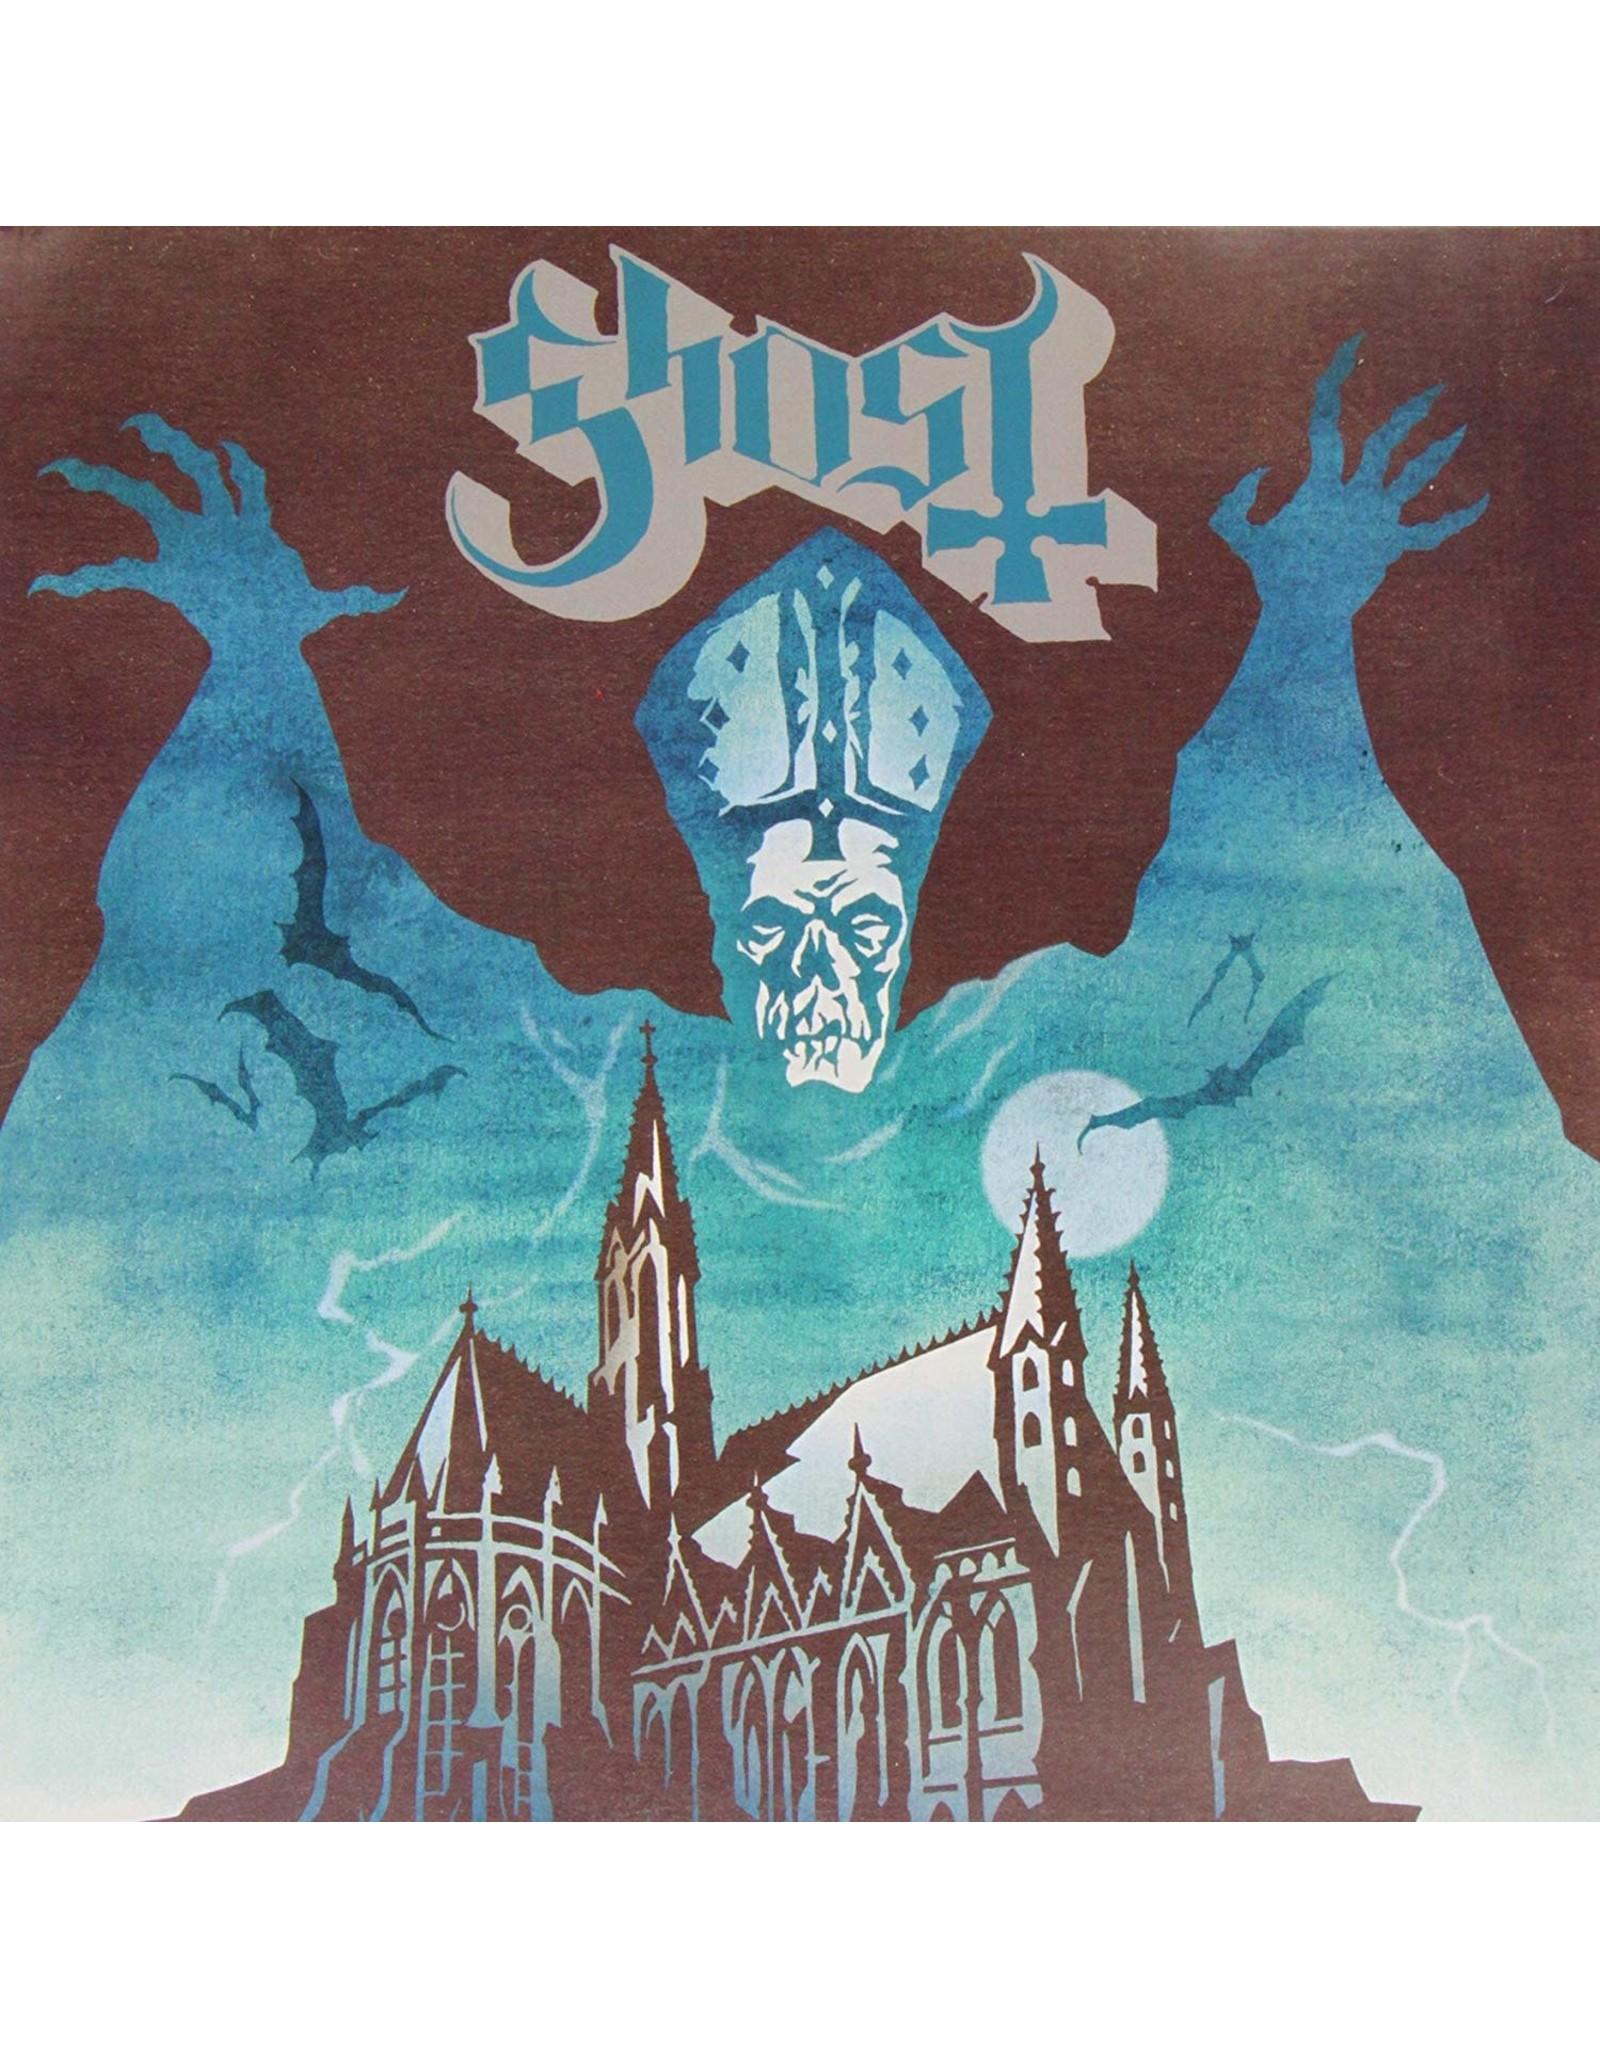 Ghost - Opus Eponymous